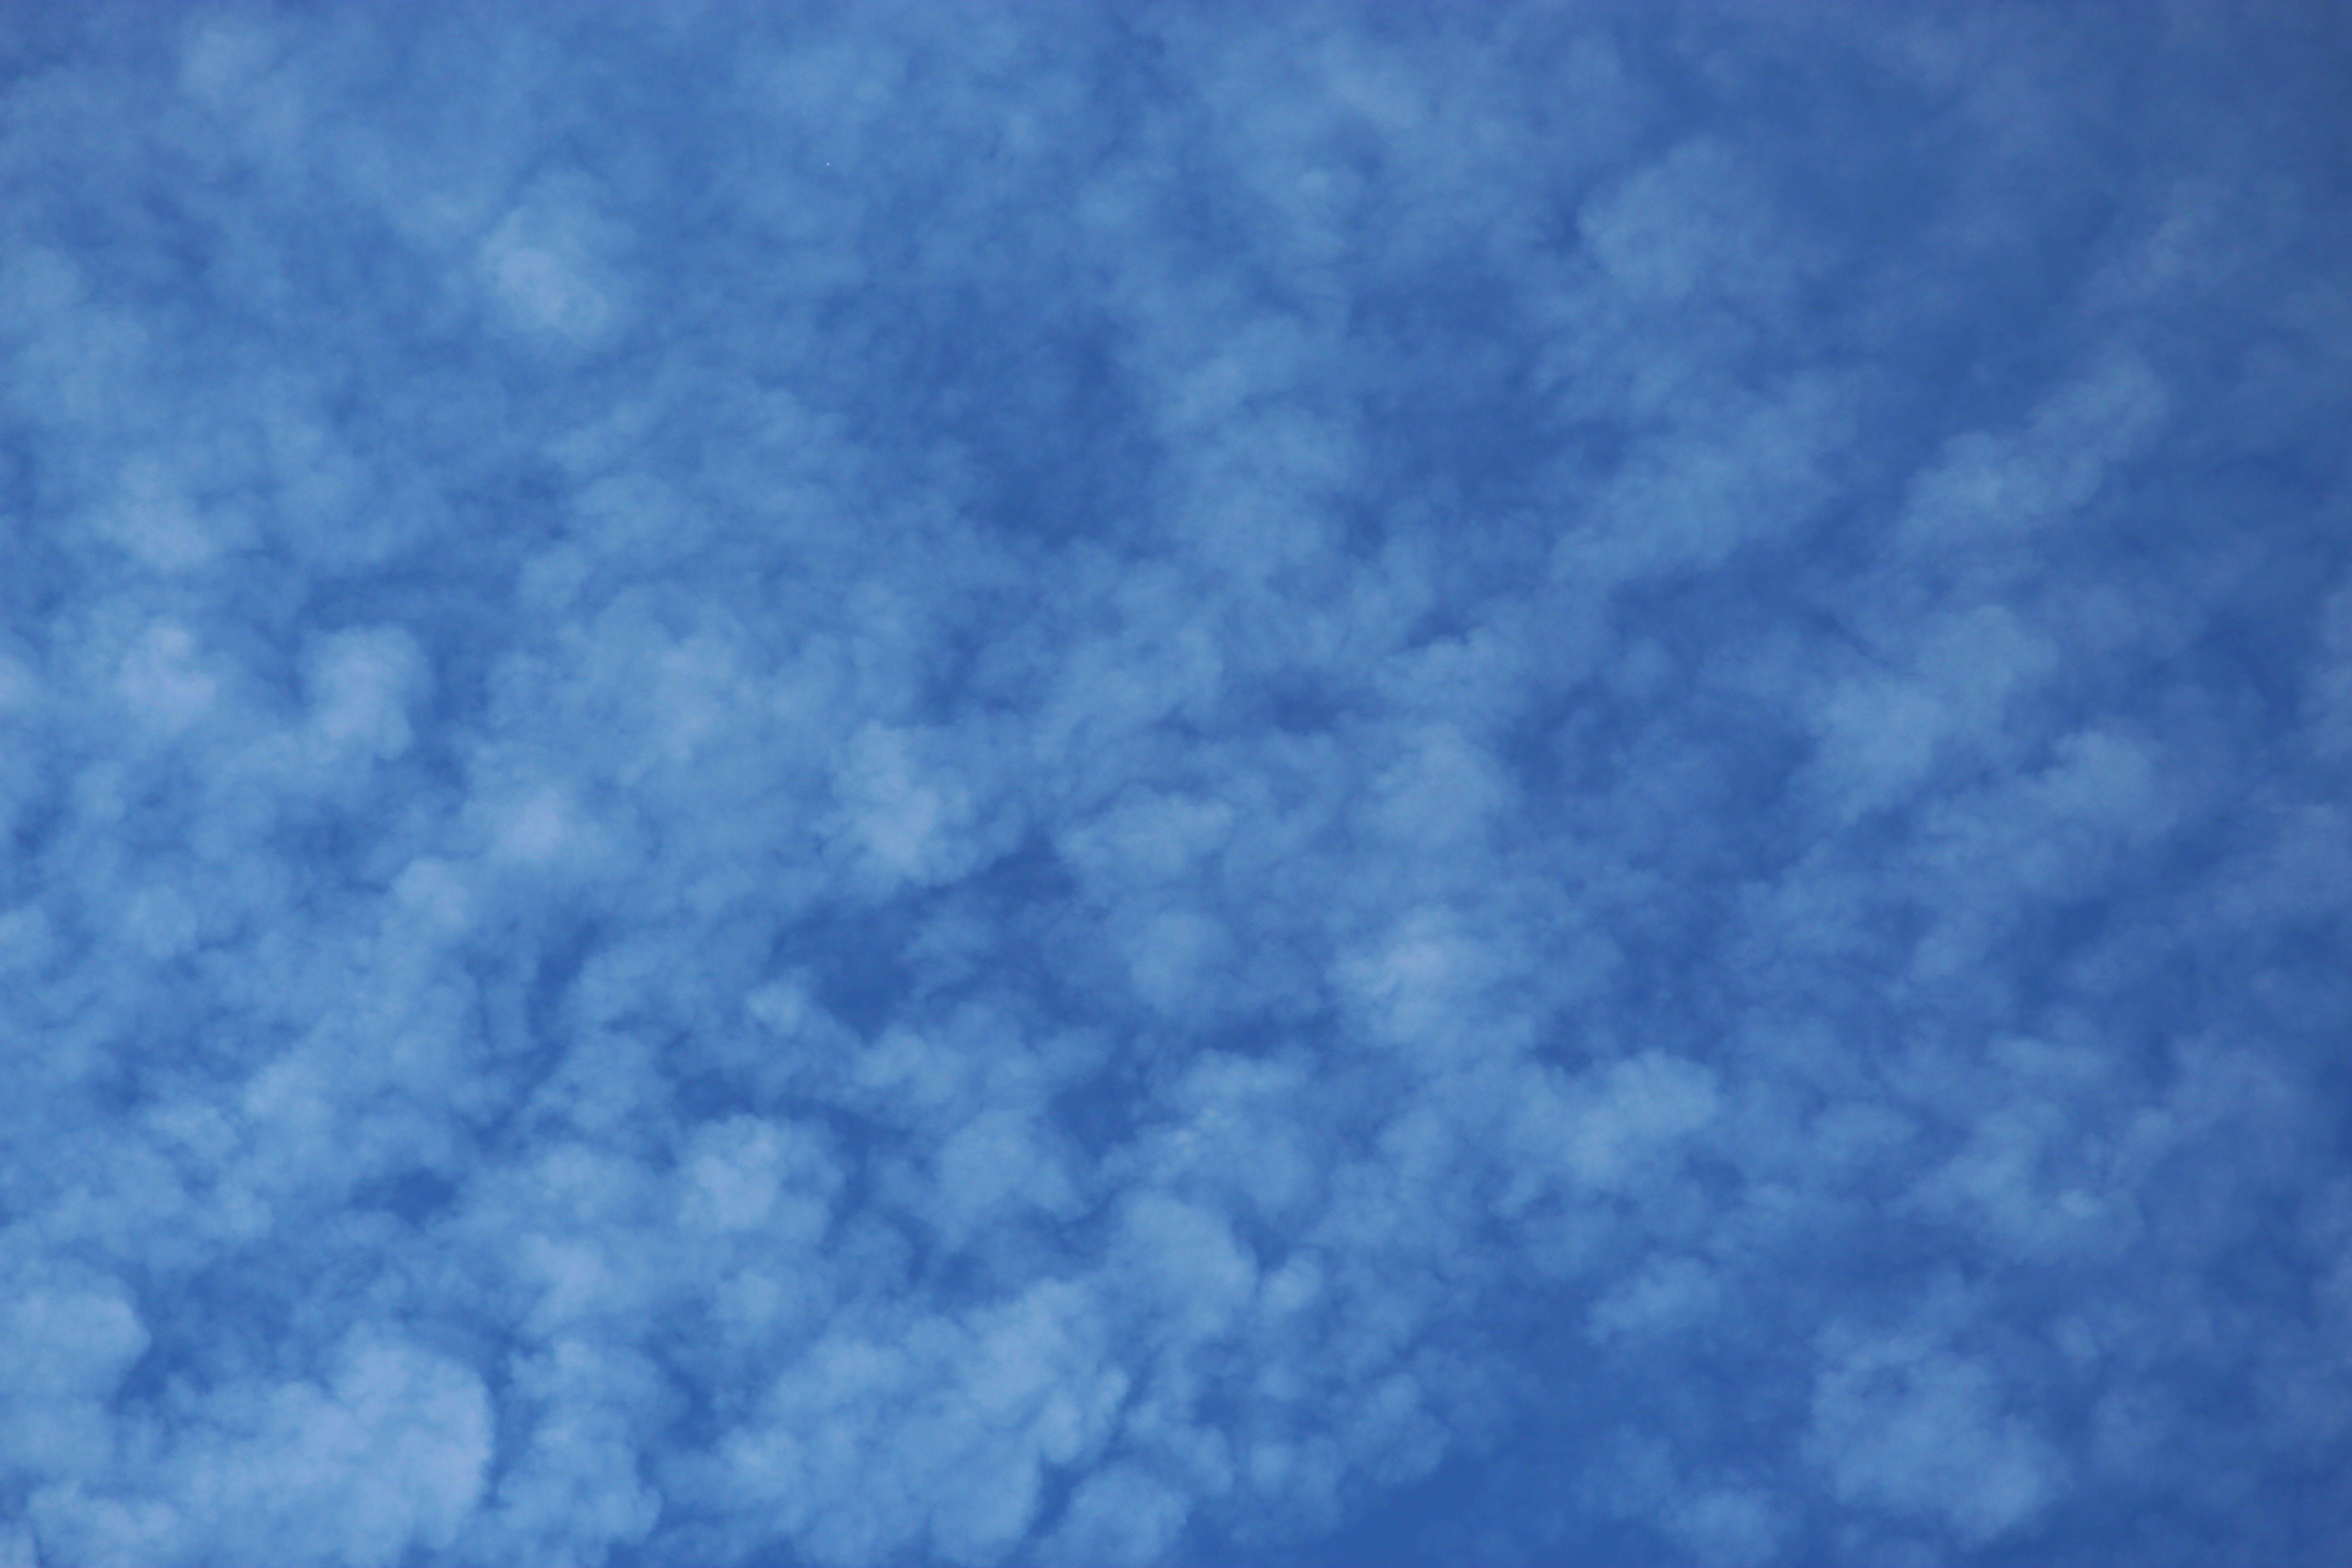 atmosphere, bliss, blue sky